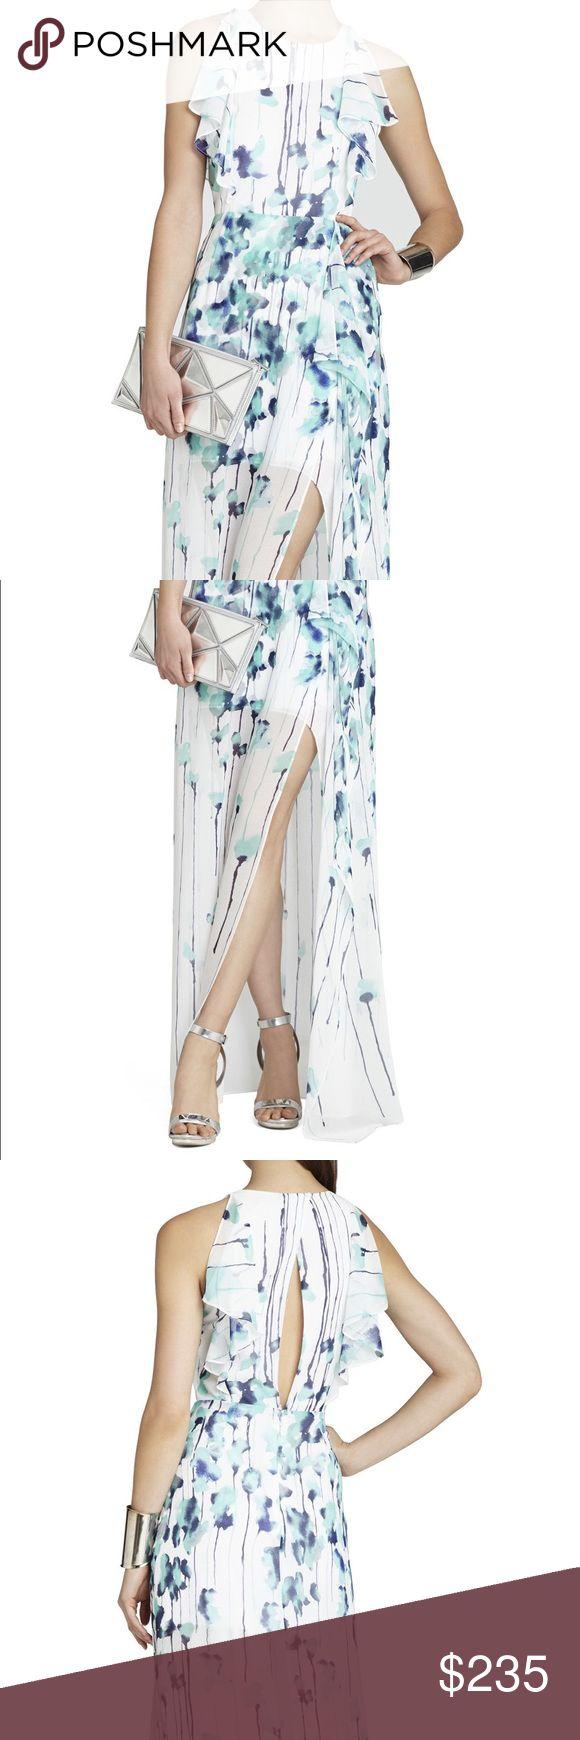 Bcbg dress Maribrl dress is unique brand new with tag BCBGMaxAzria Dresses Asymmetrical